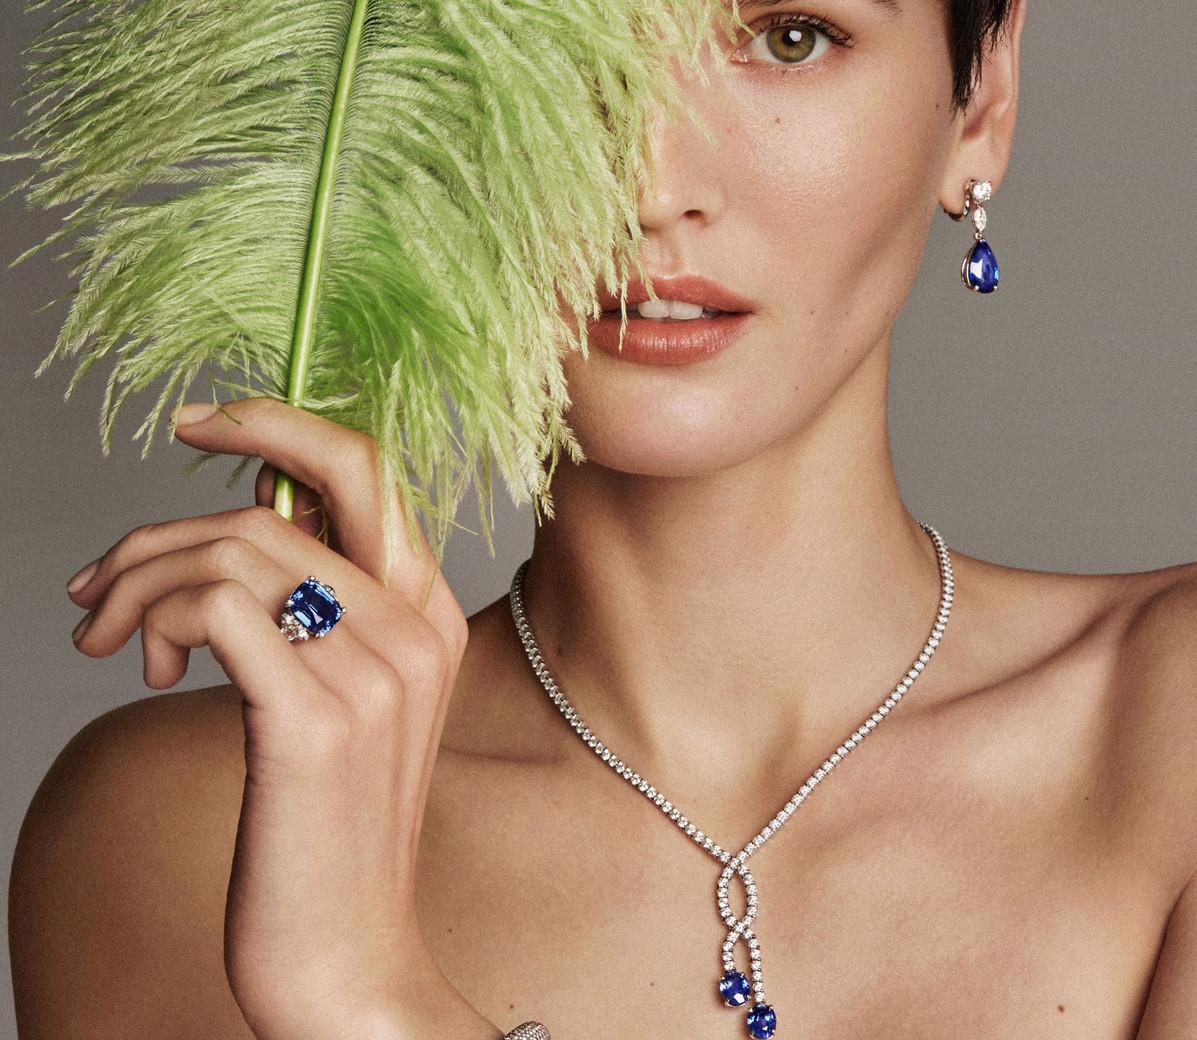 2020_16_12_ OK Vanity_Jewels&Piume_01_064_sRGB.jpg